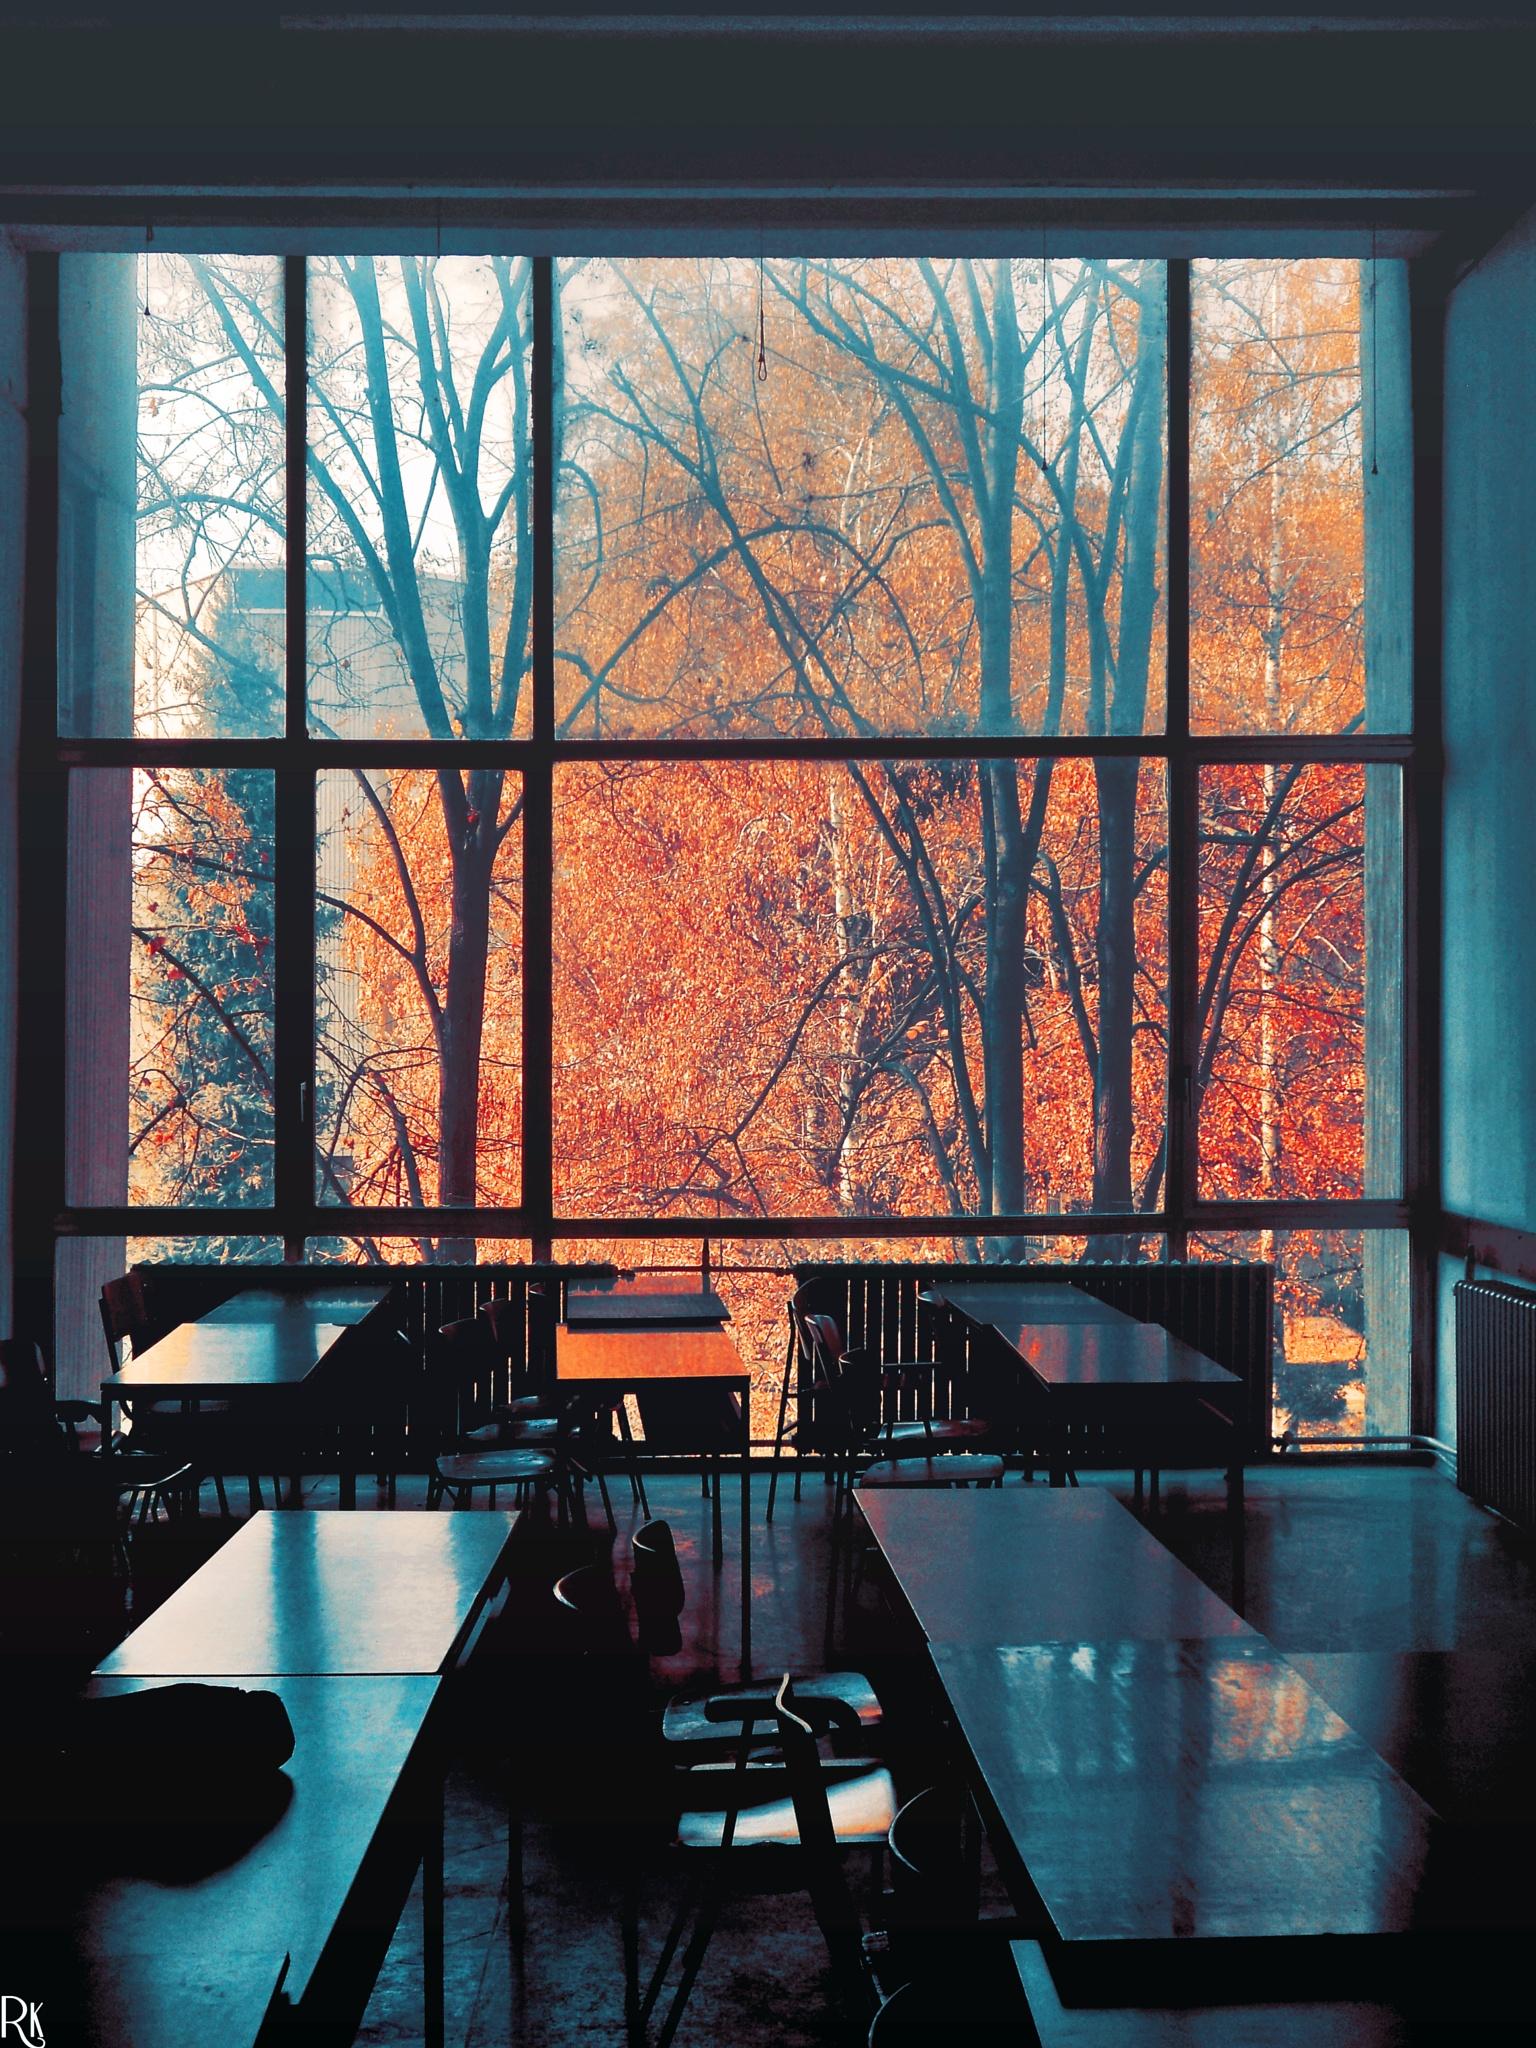 Classroom by Robert Krstevski